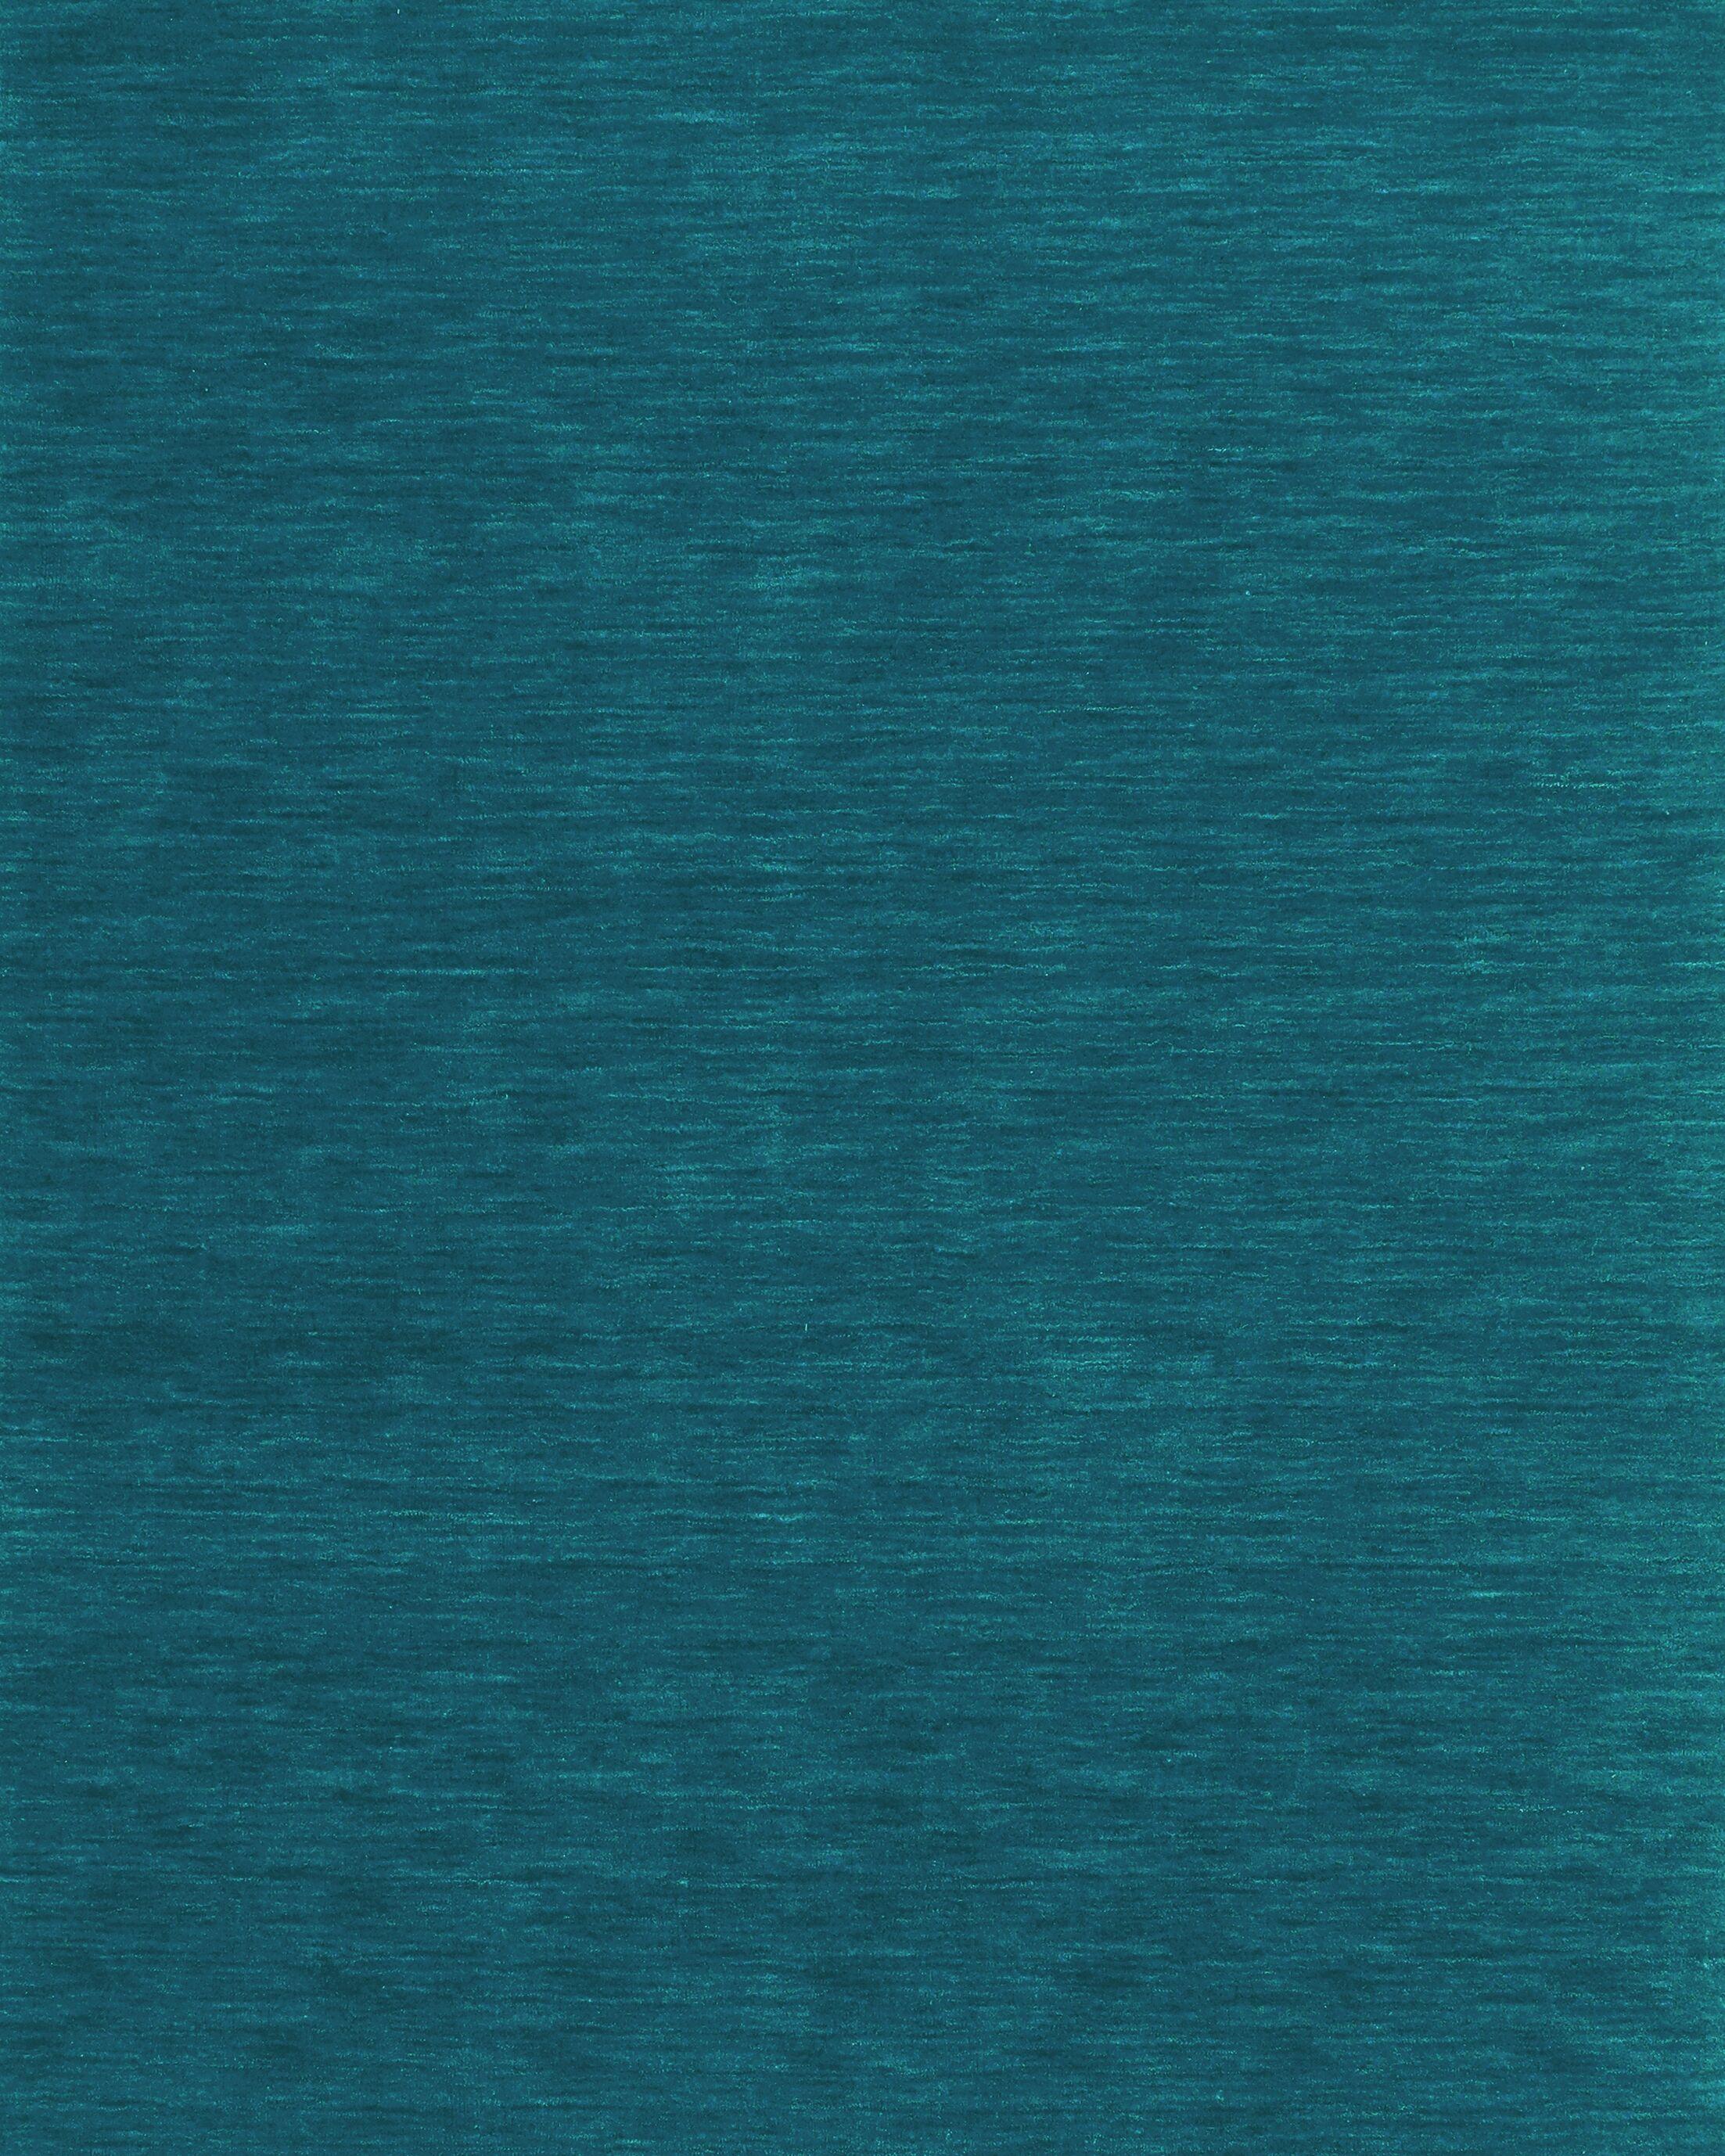 Blue Area Rug Rug Size: Rectangle 9'6